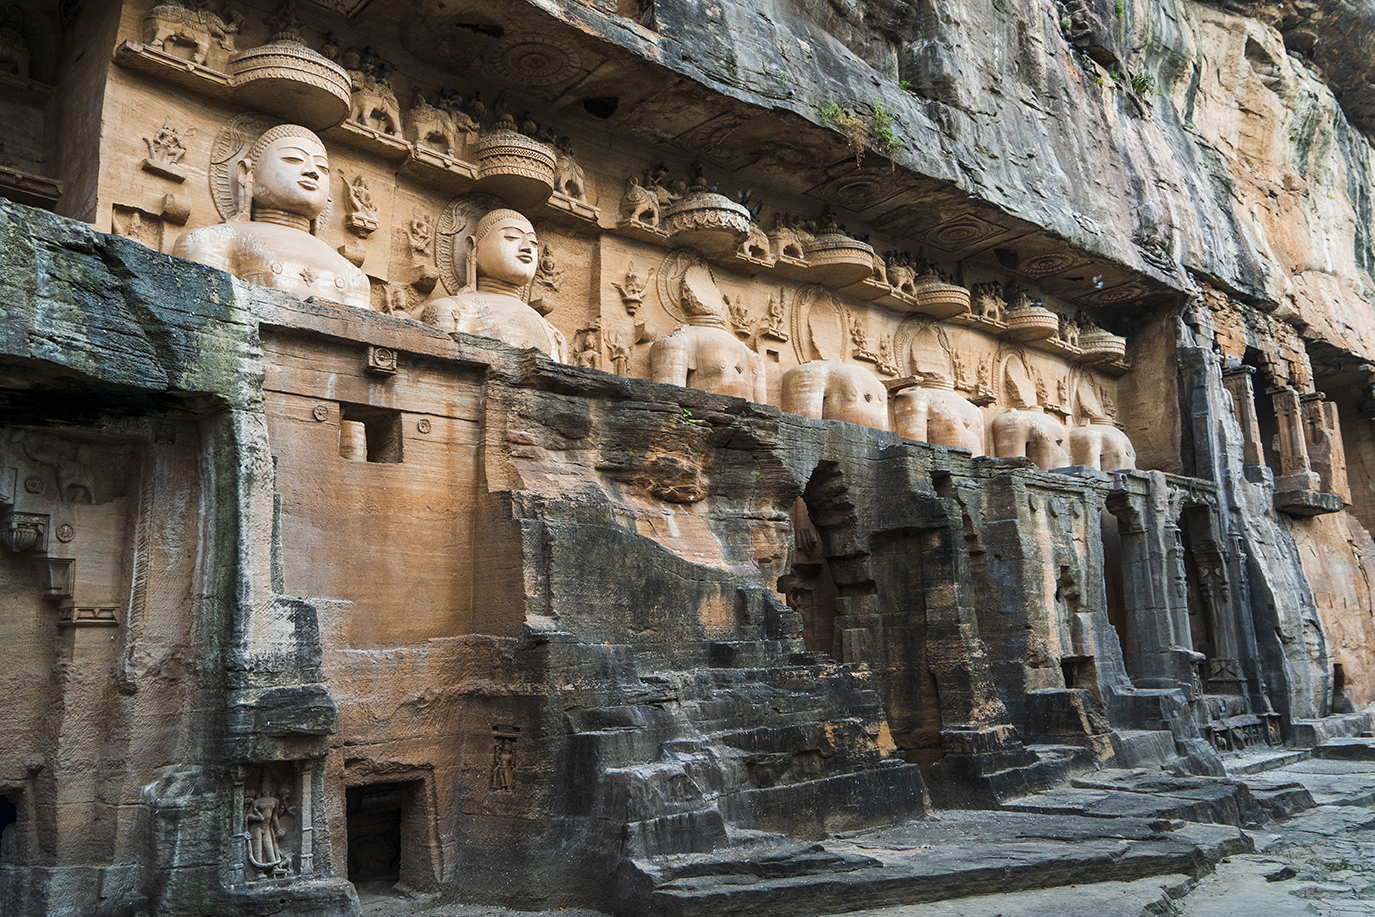 Cluster of Jain statues at the Ek Patthar Ki Bawadi group